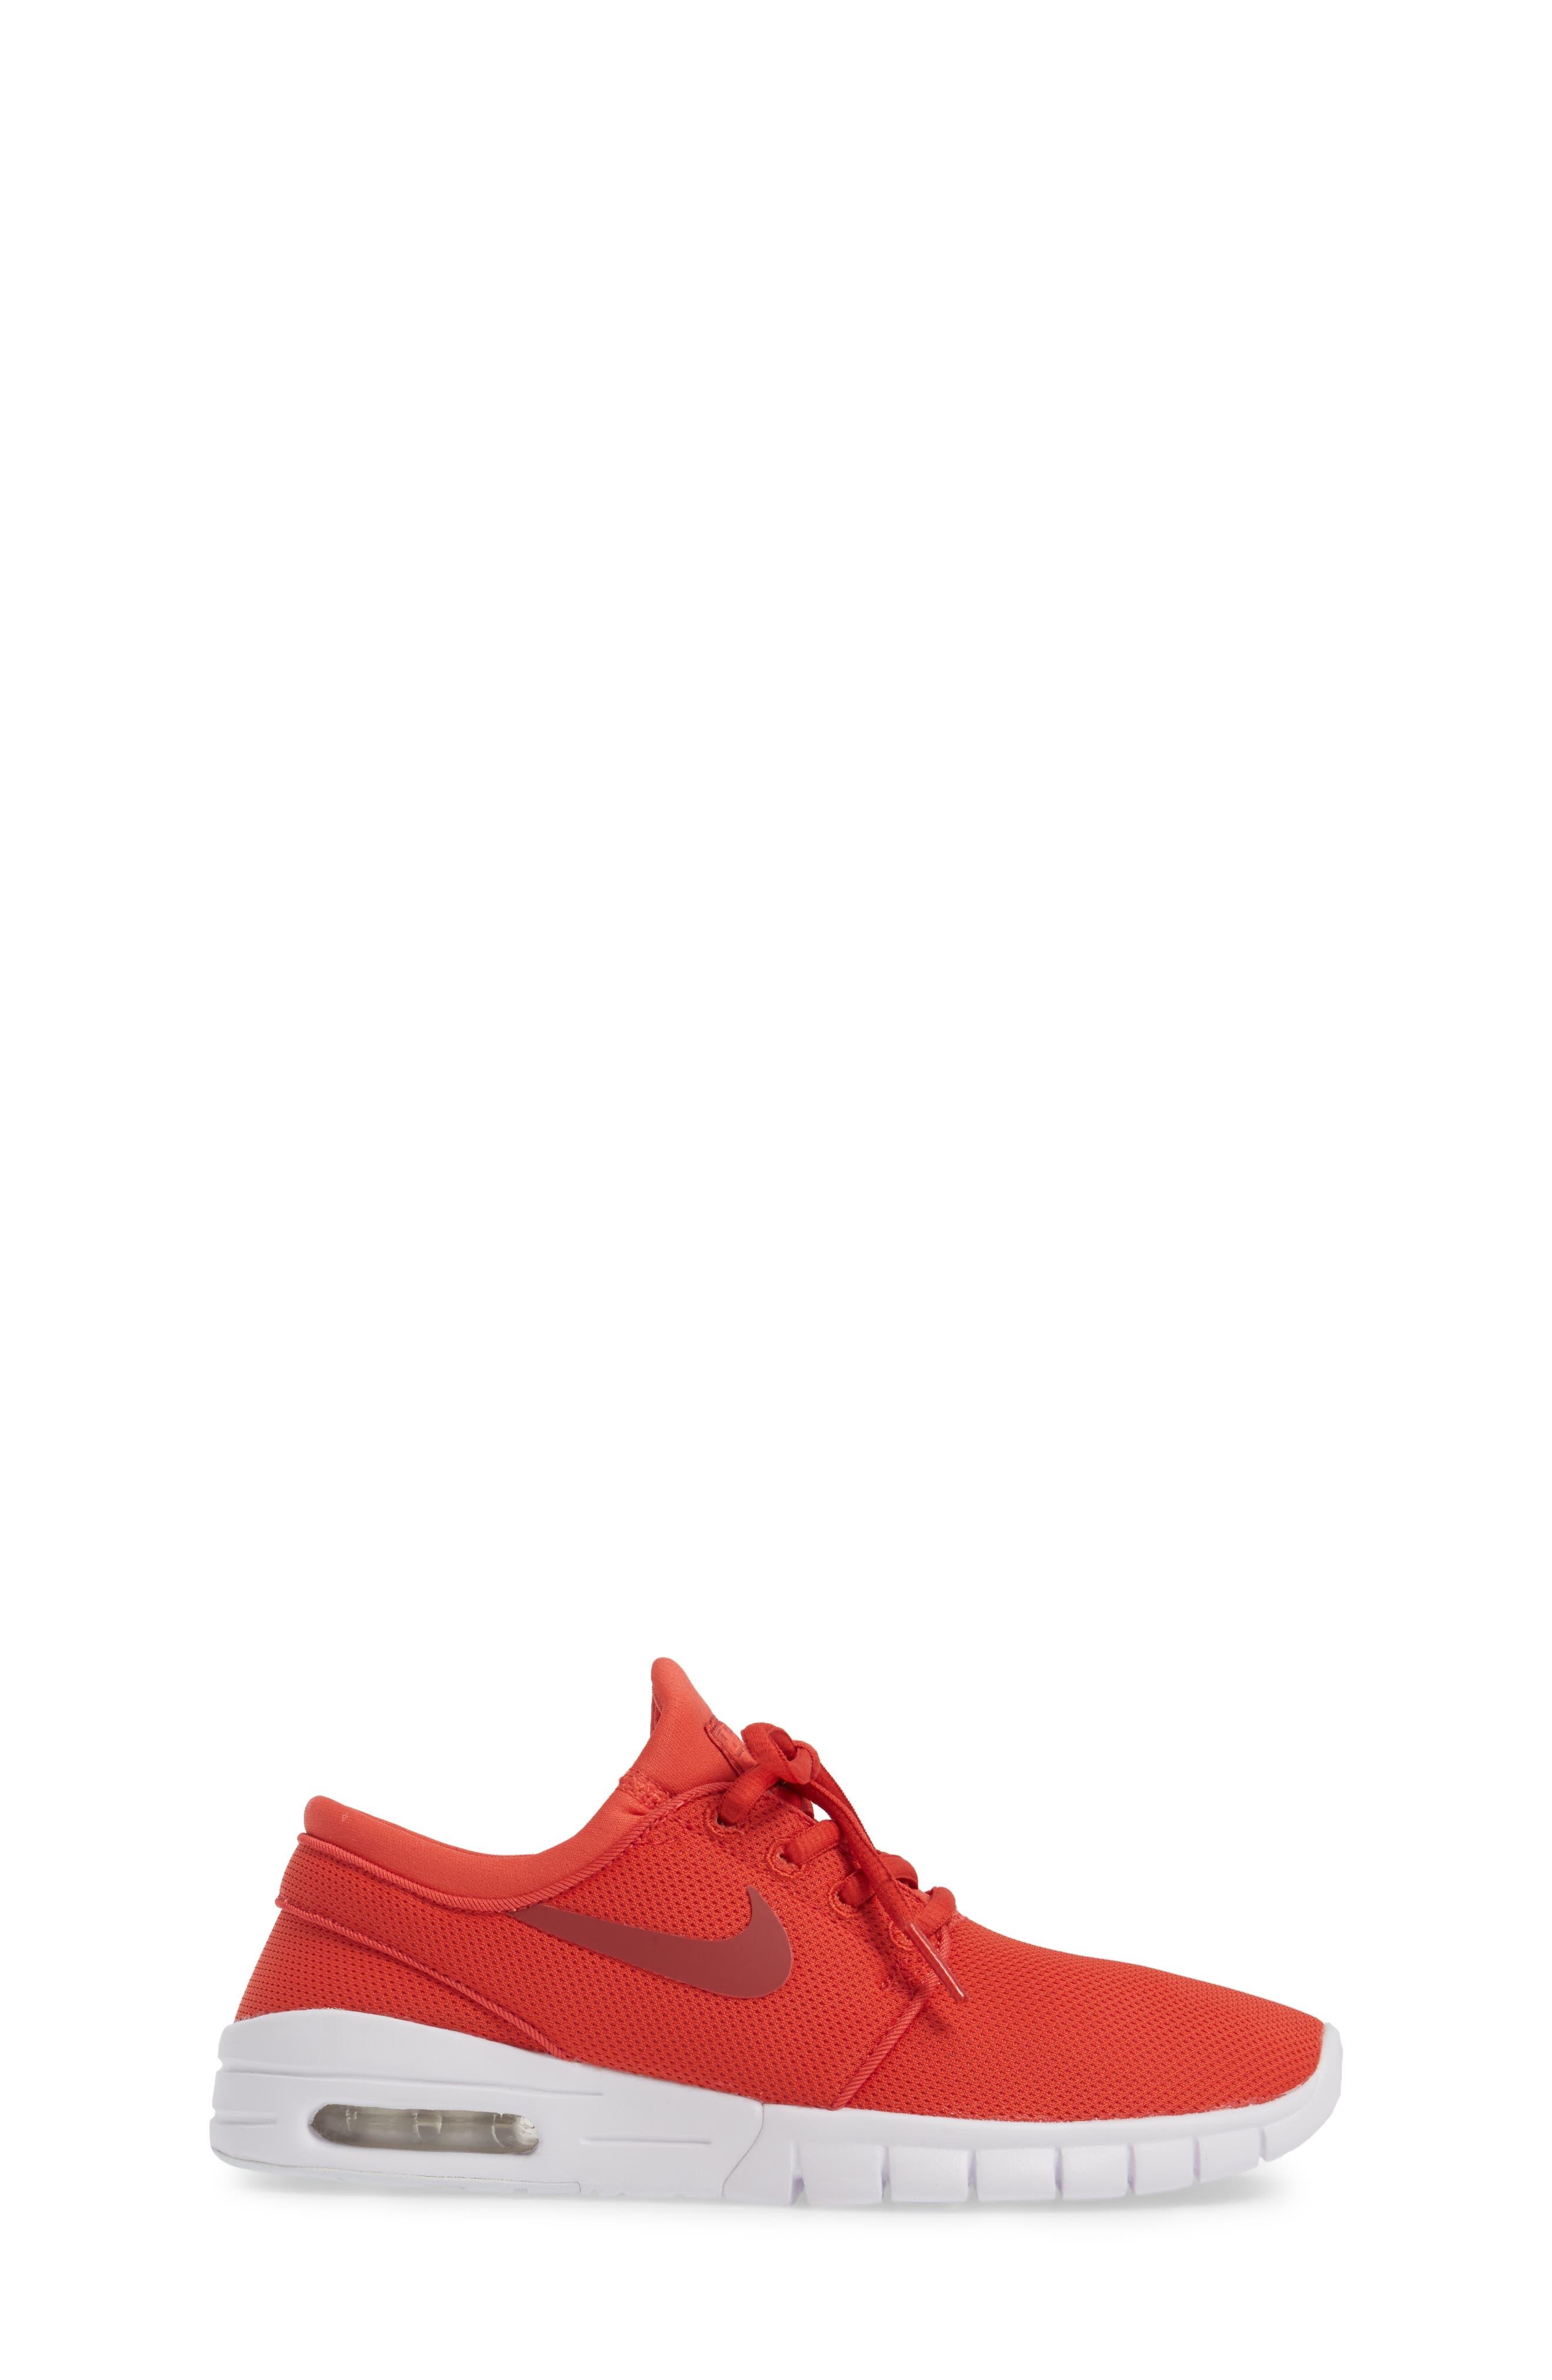 Stefan Janoski Max SB Skate Sneaker,                             Alternate thumbnail 26, color,